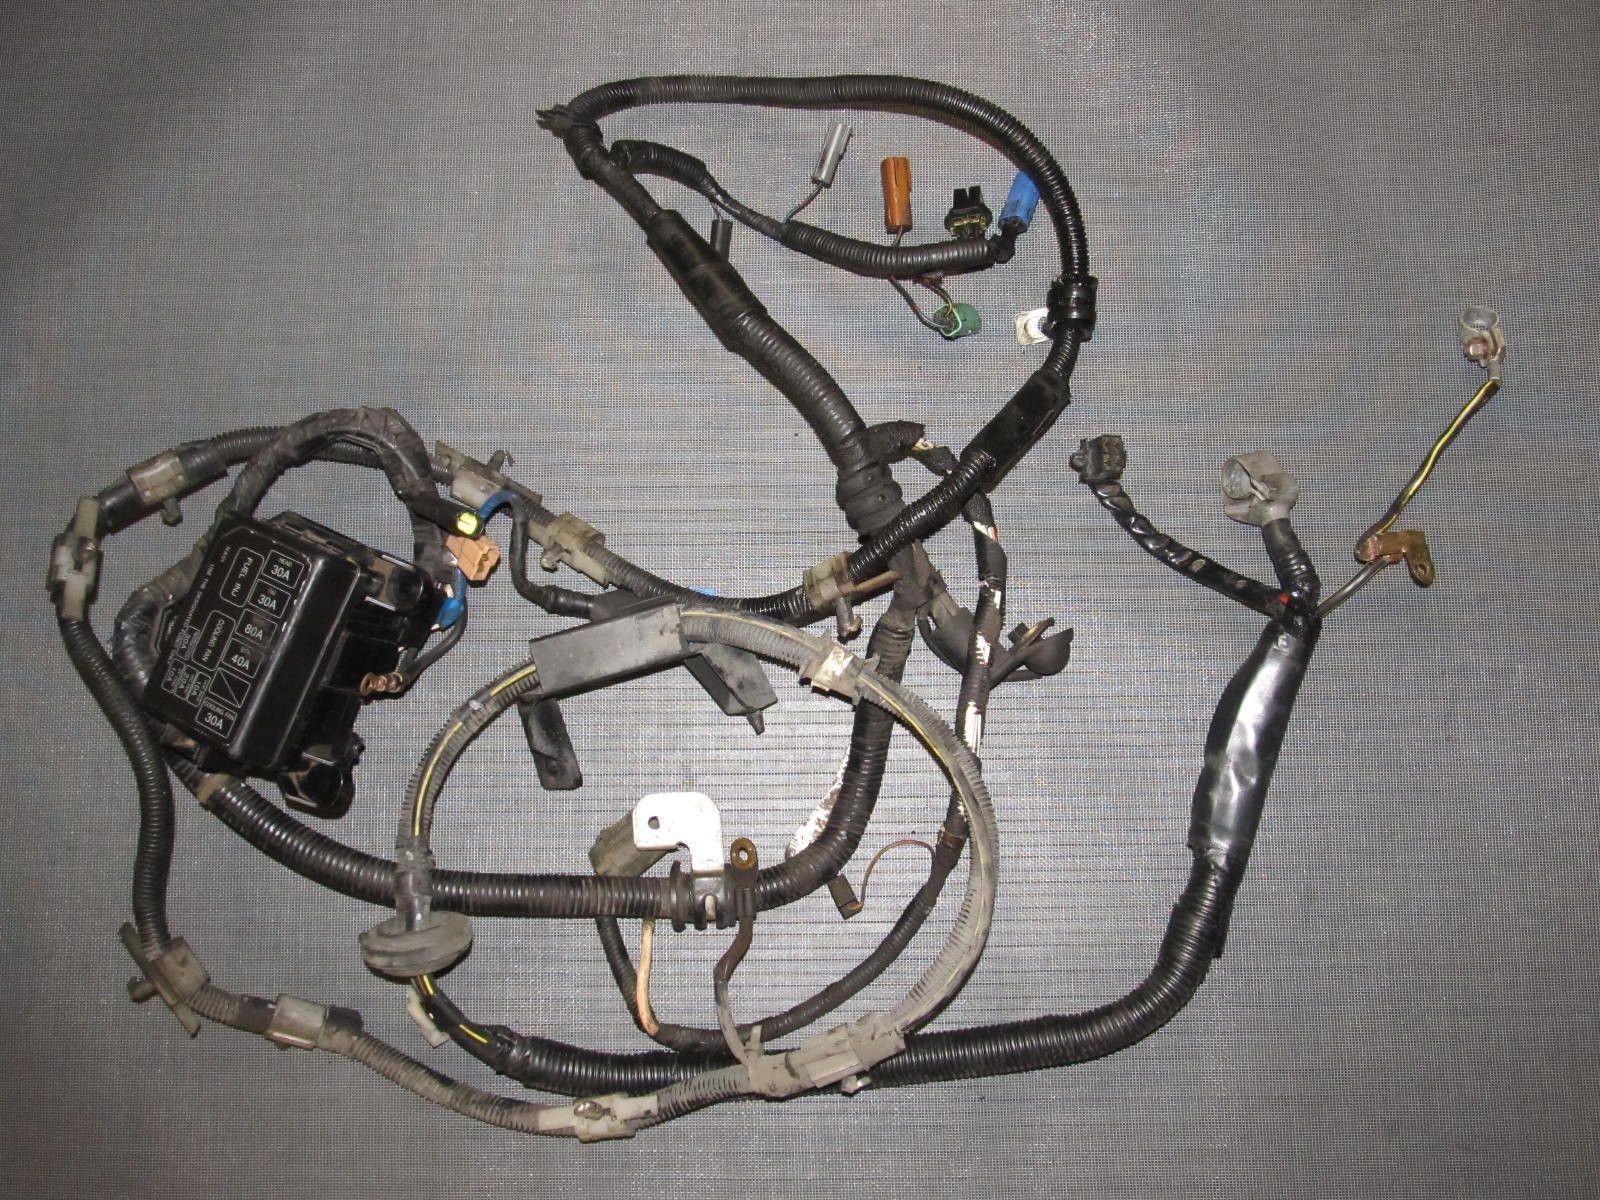 90-93 Mazda Miata OEM Engine Wiring Harness